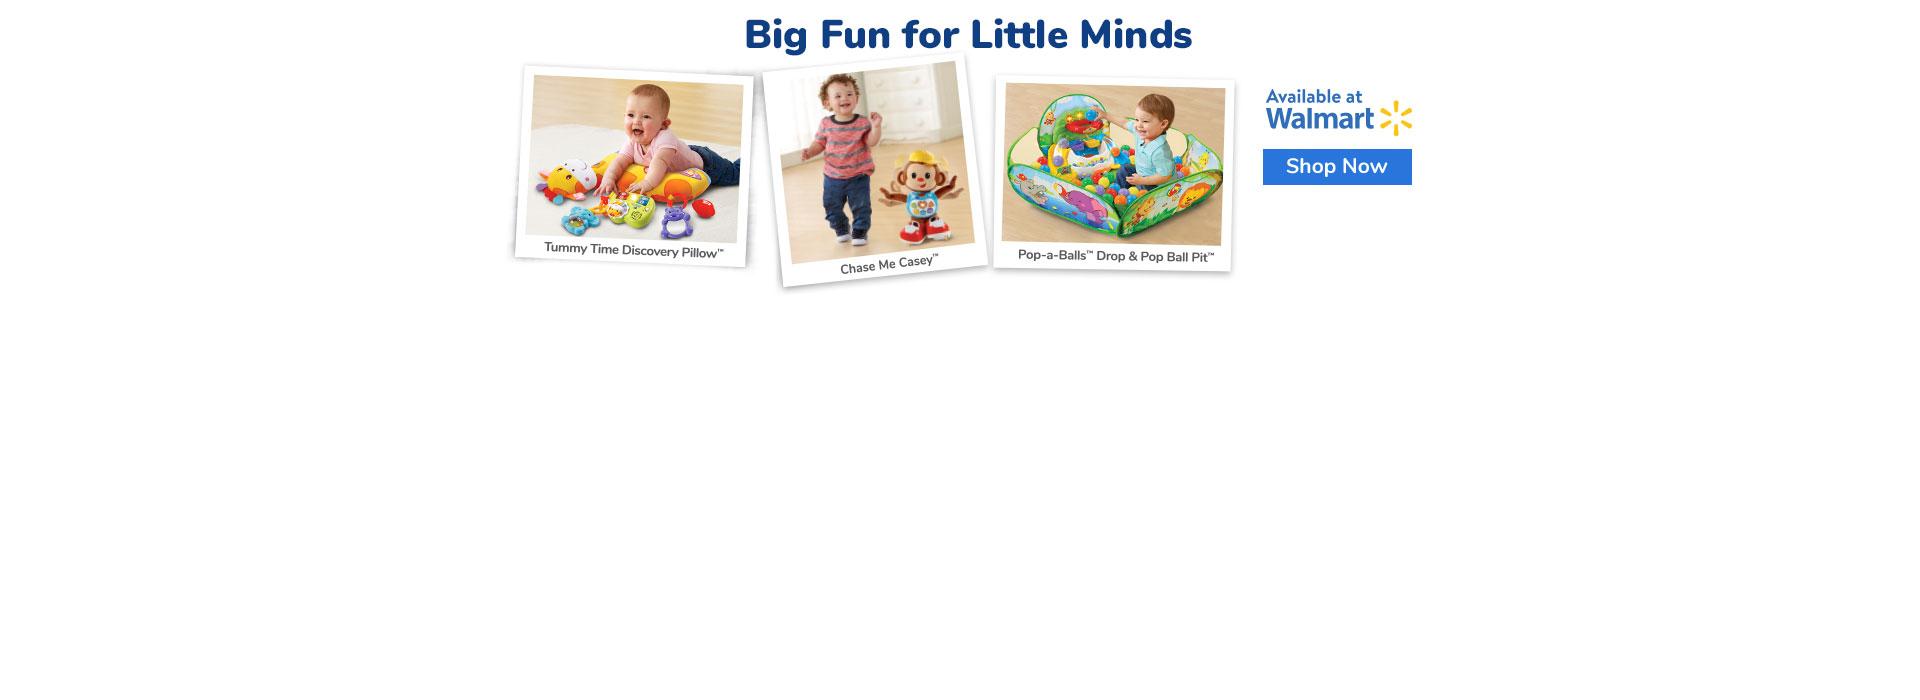 Infant, Toddler & Preschool Toys at Walmart | Shop Now